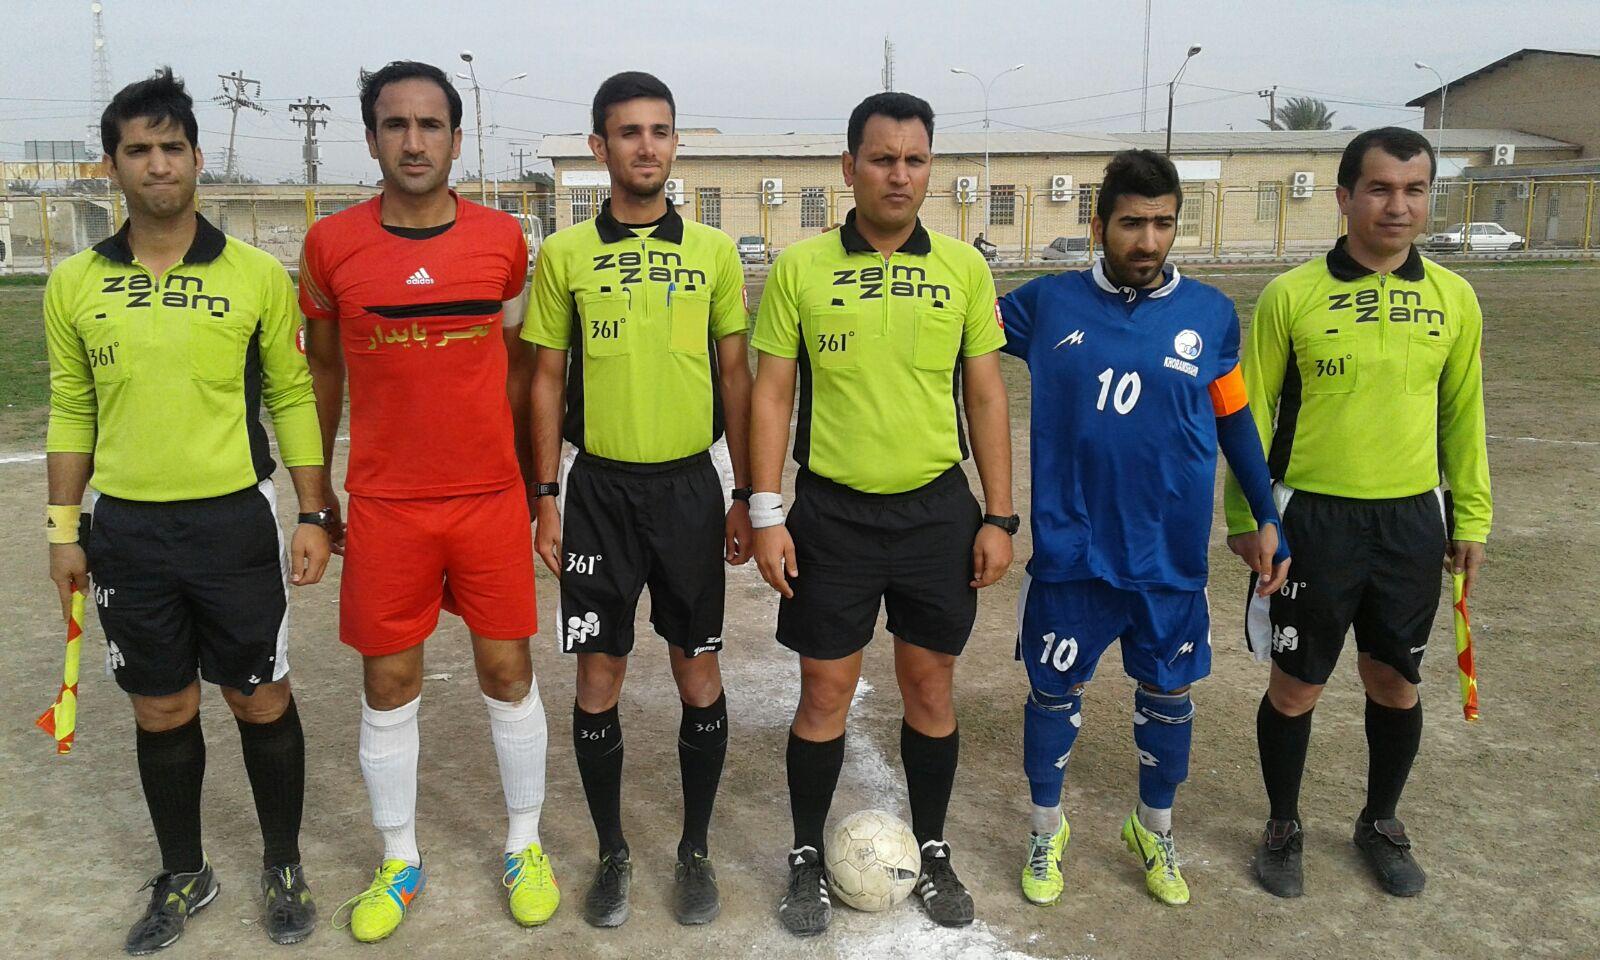 نتایج هفته سوم مسابقات فوتبال لیگ برتر بزرگسالان خوزستان